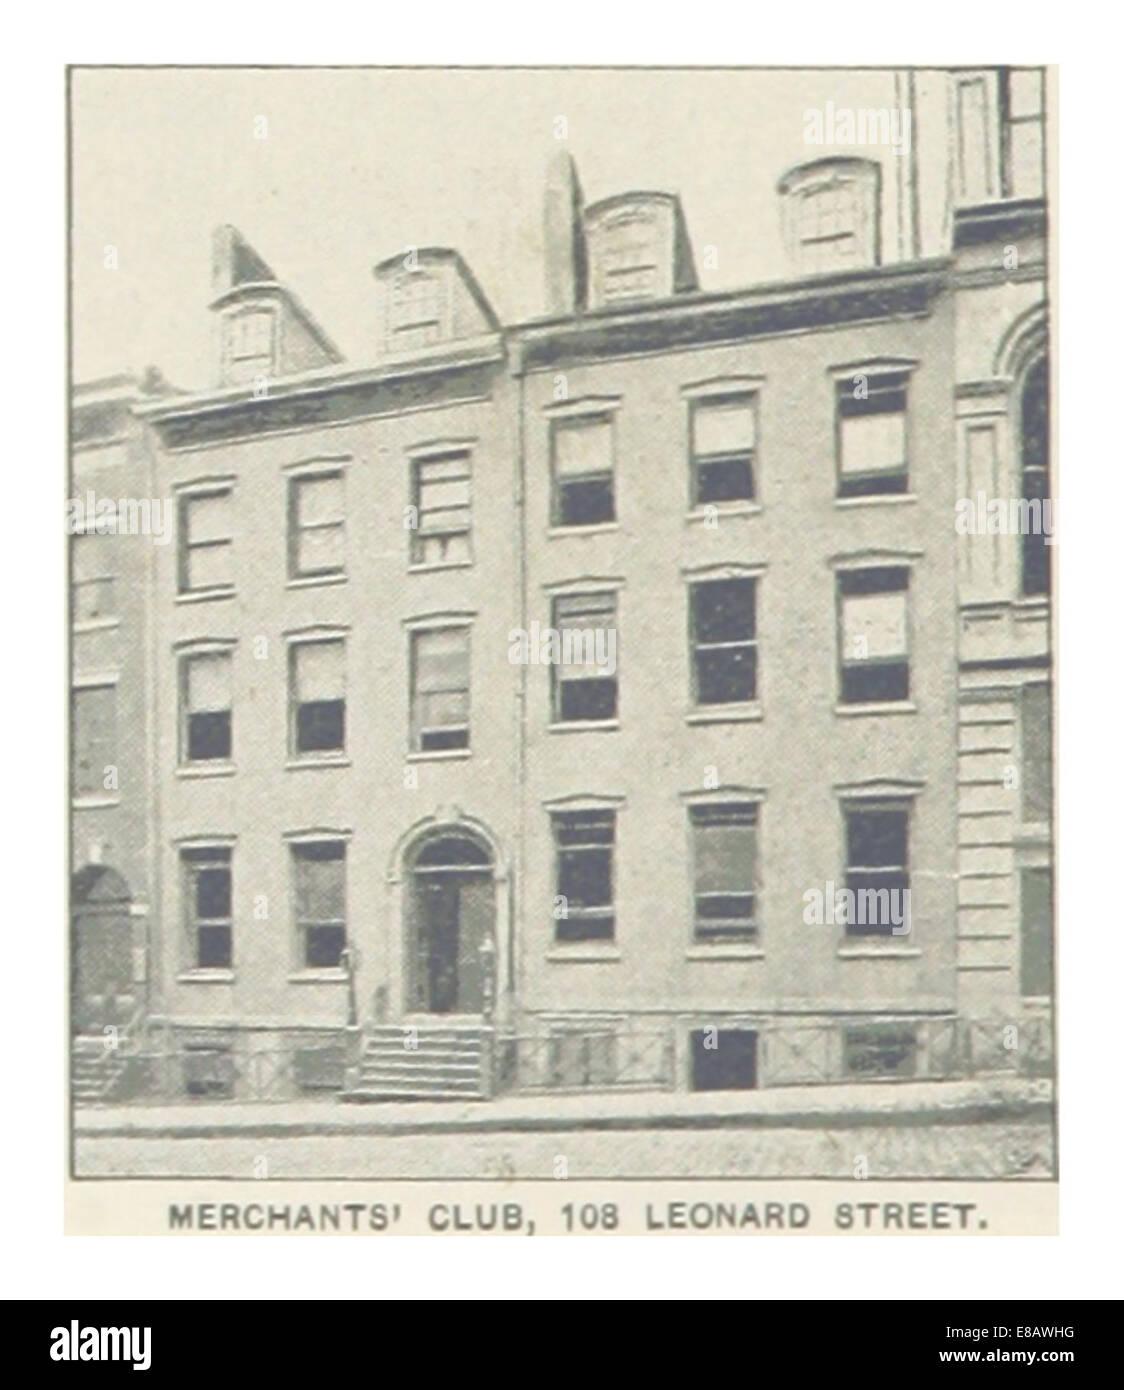 (King1893NYC) pg564 MERCHANTS' CLUB, 108 LEONARD STREET - Stock Image